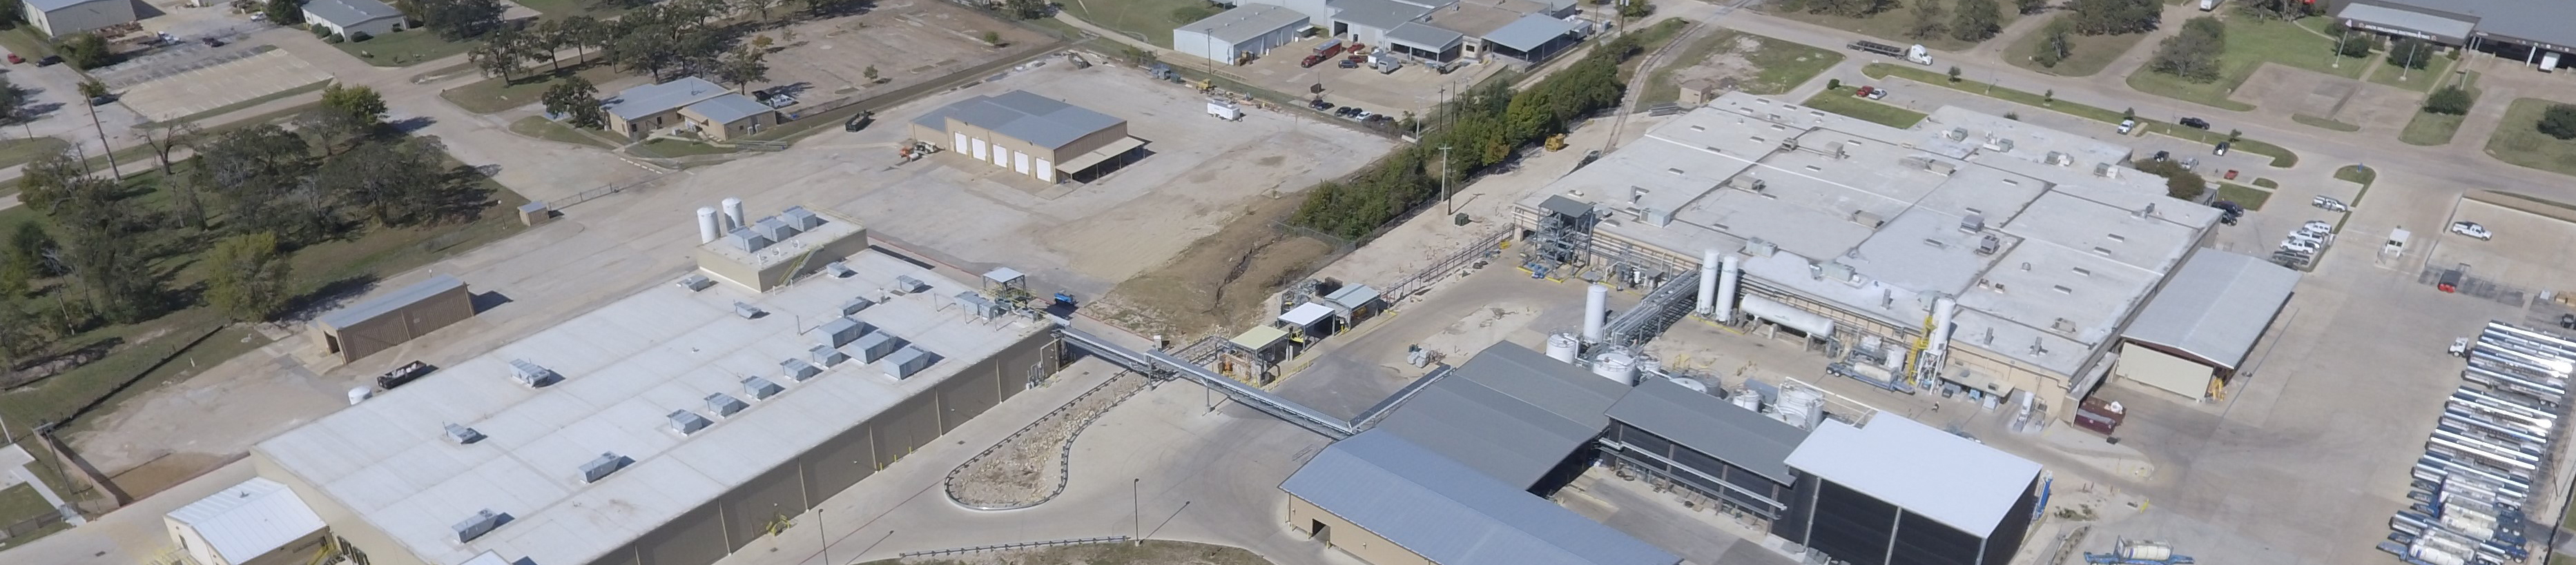 Bryan, Texas LSPI Manufacturing Campus